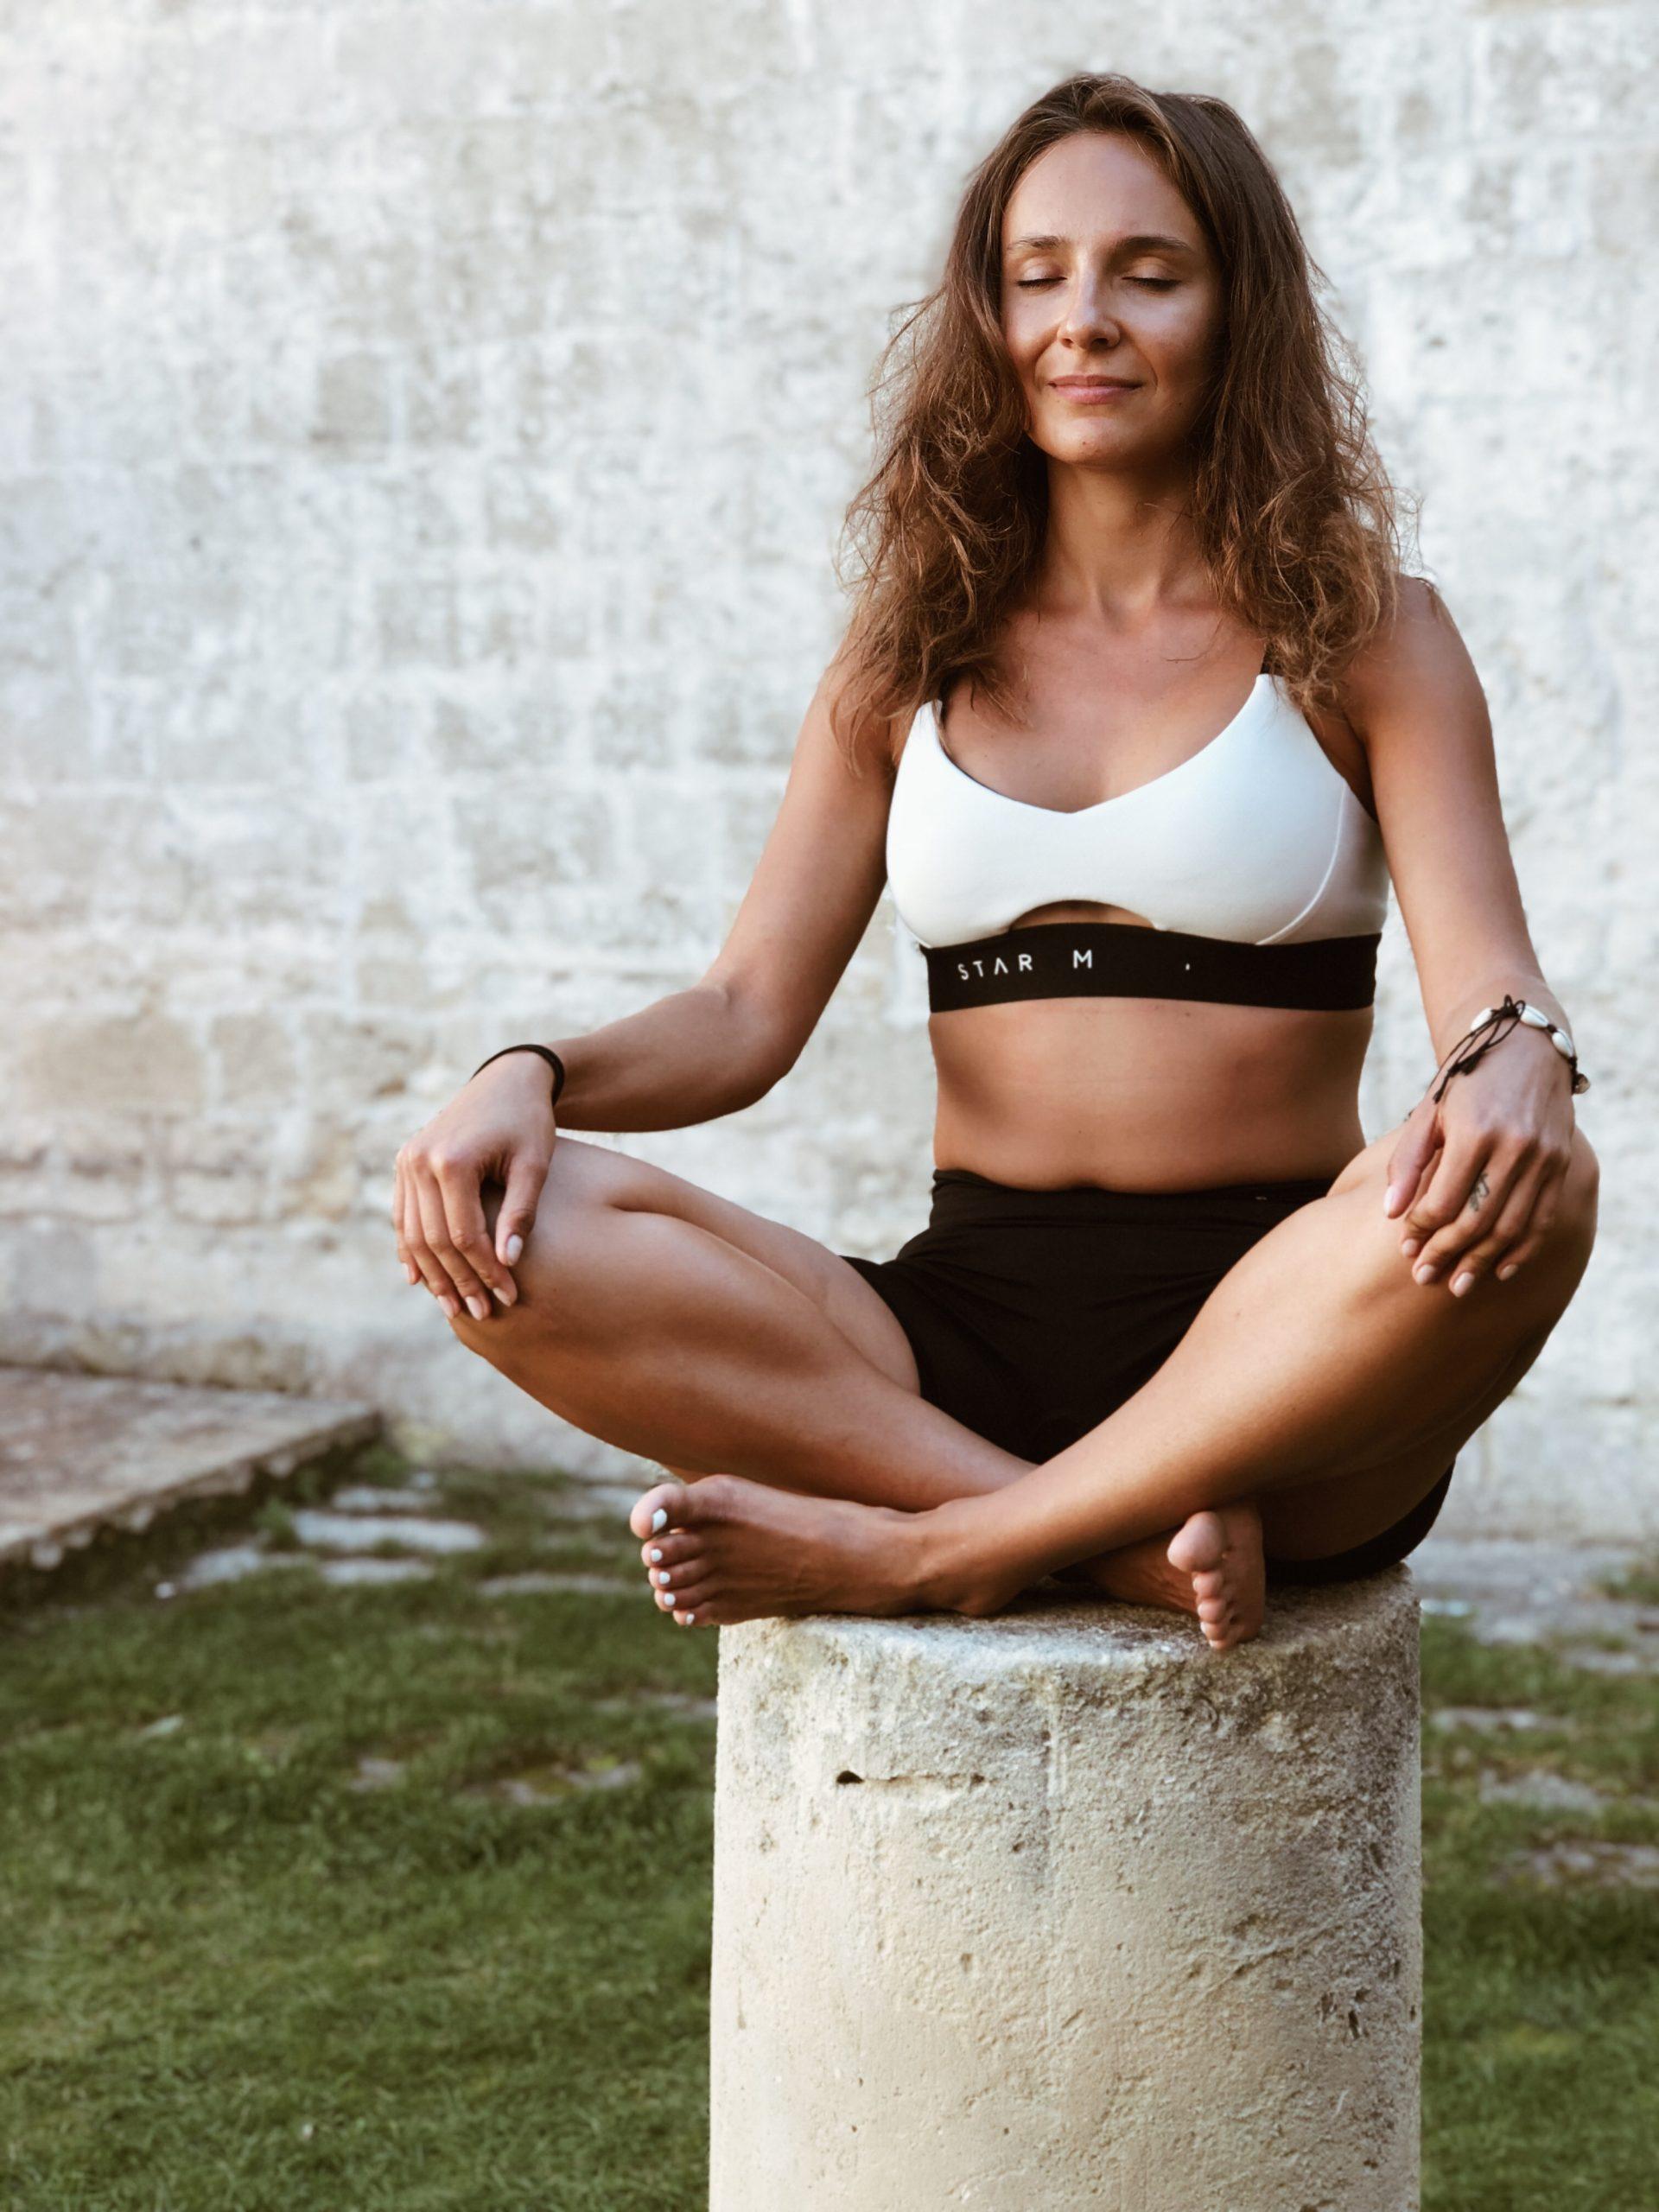 Aleksandra Dul - Yoga and Meditation Instructor